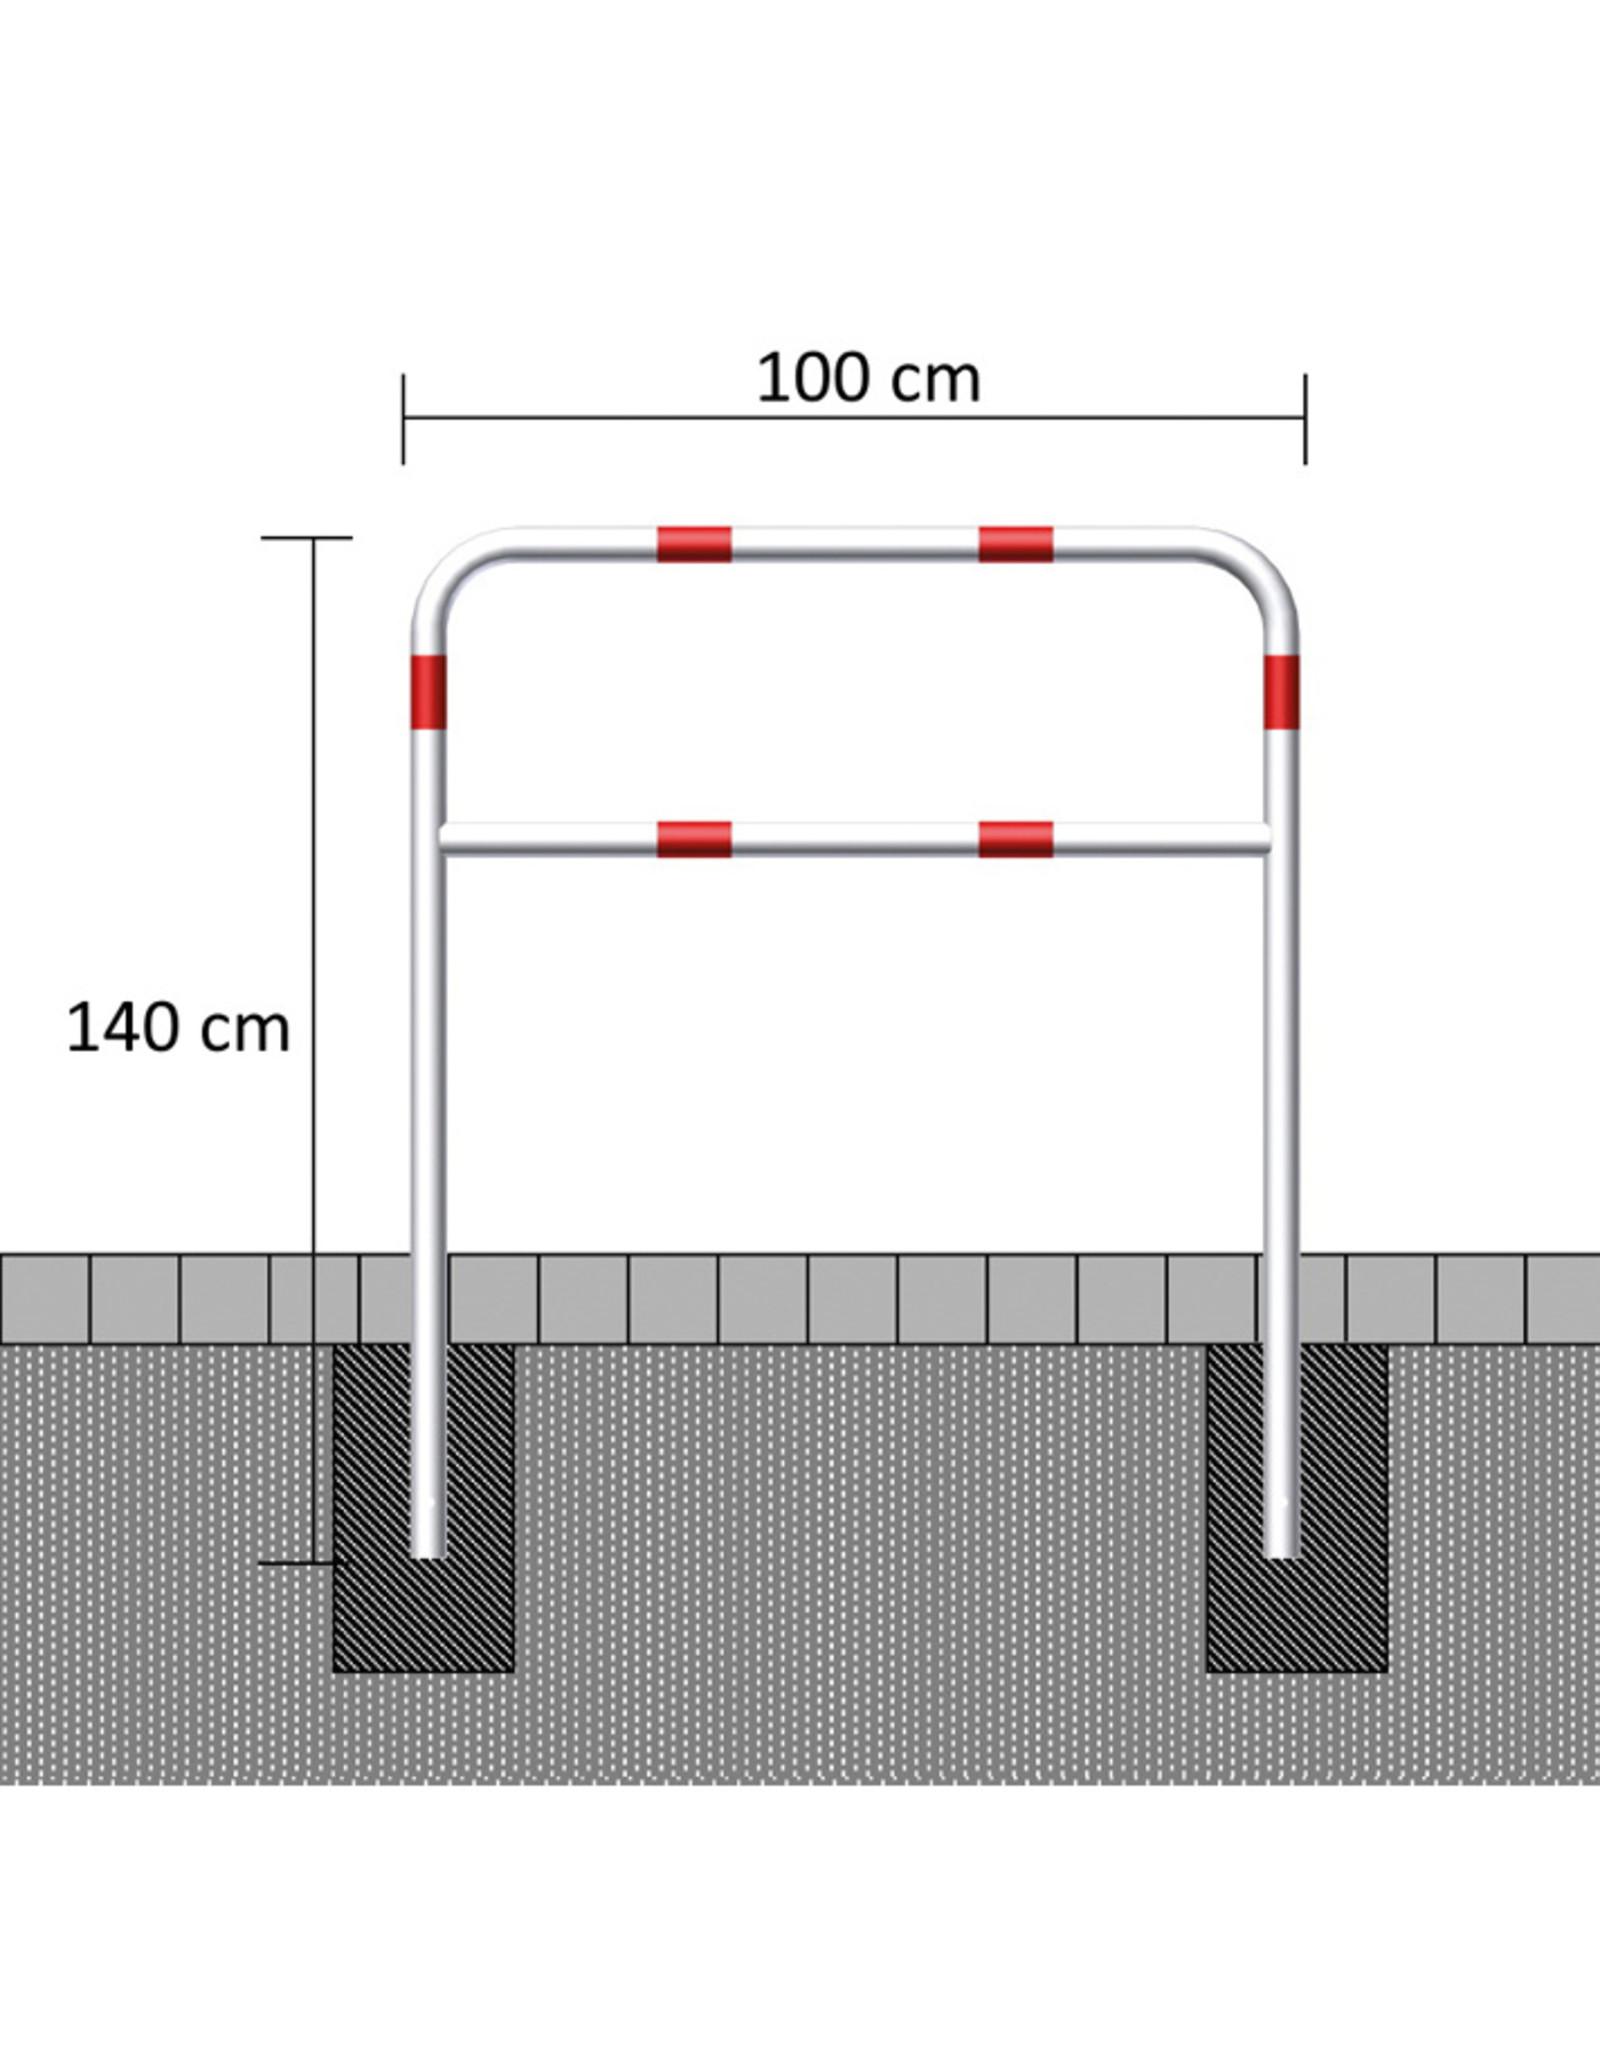 Ri-Traffic | Fietssluis Staal, Rood-Wit, 100 cm x 140 cm